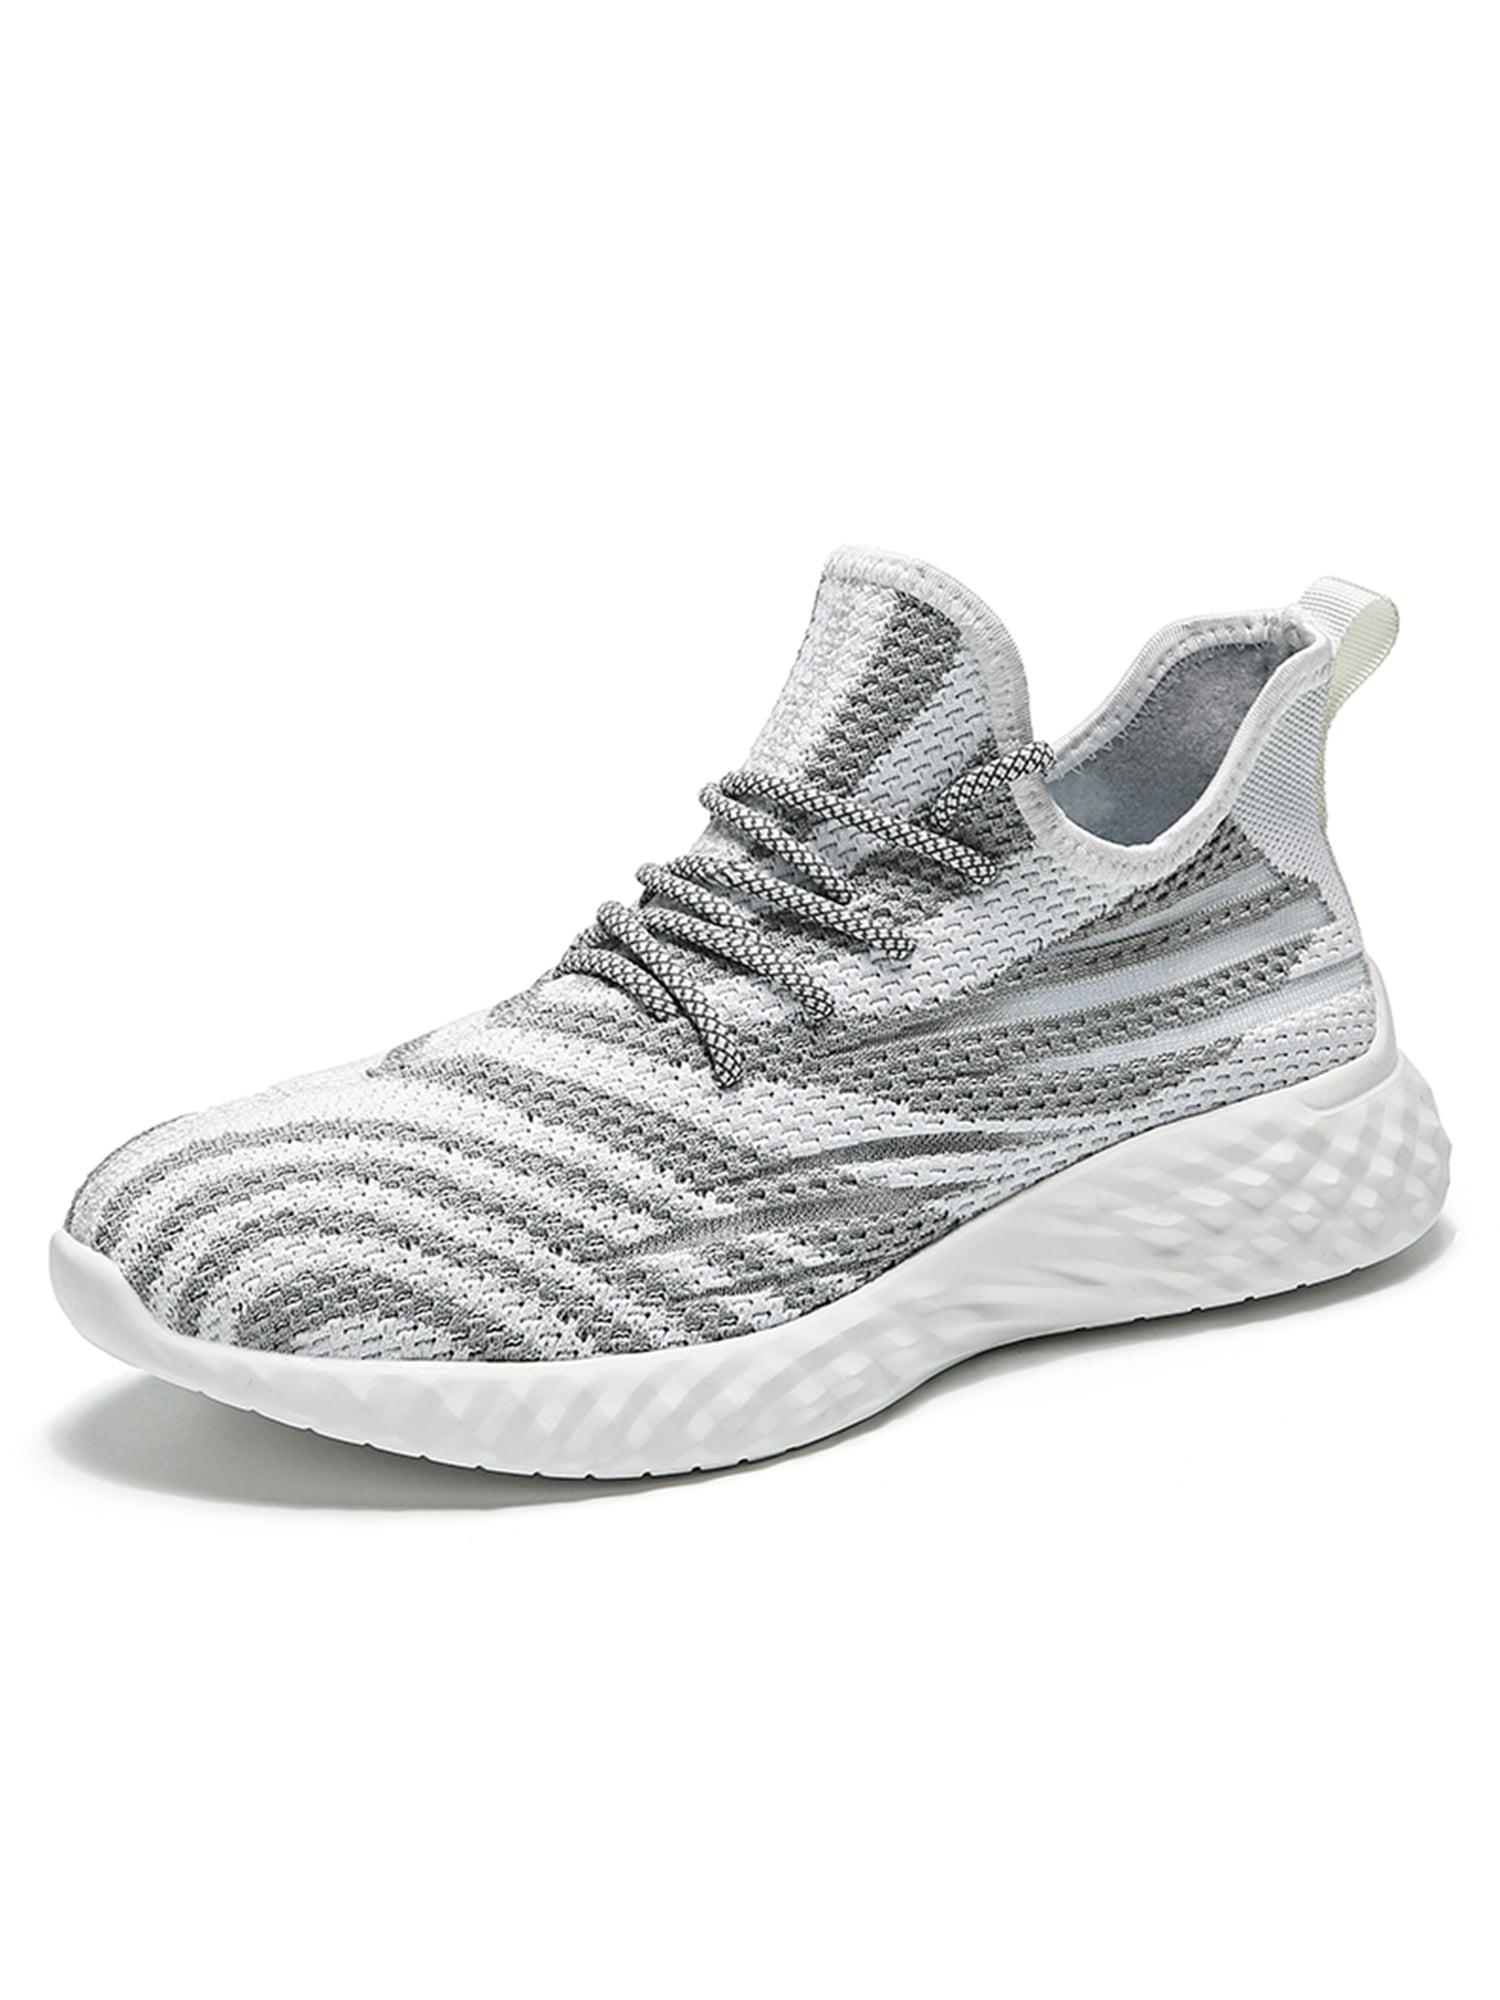 Own Shoe - Mens Yeezy Boots Summer